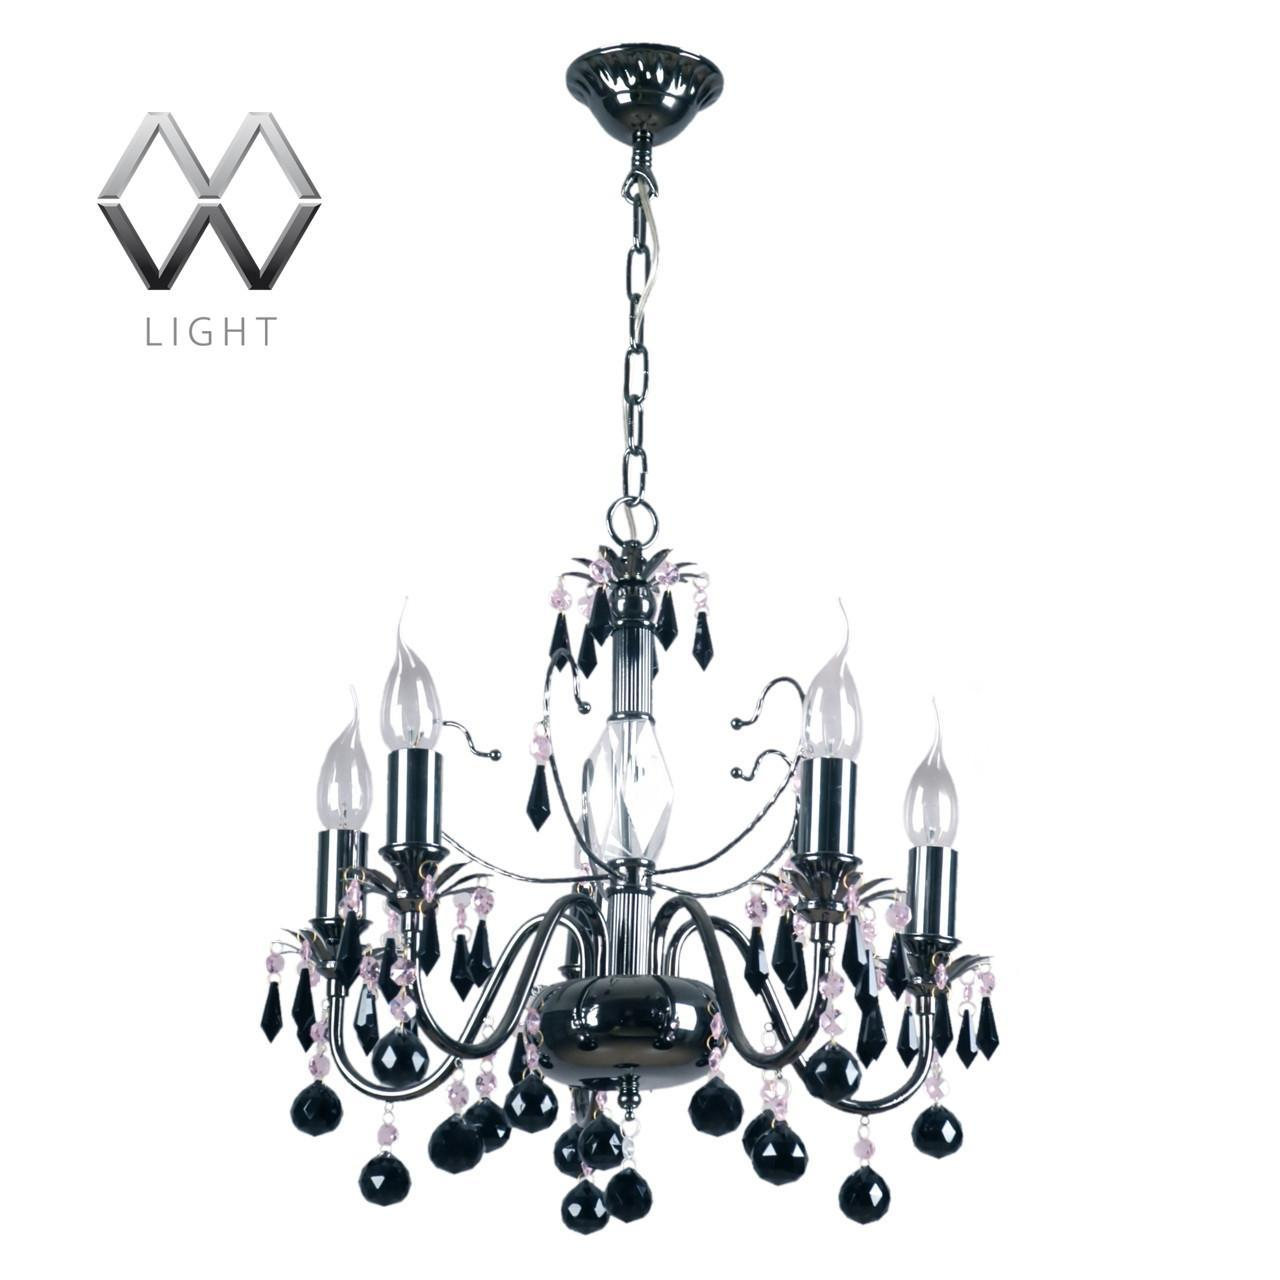 Люстра MW-Light Барселона 313010105 подвесная подвесная люстра mw light барселона 313010105